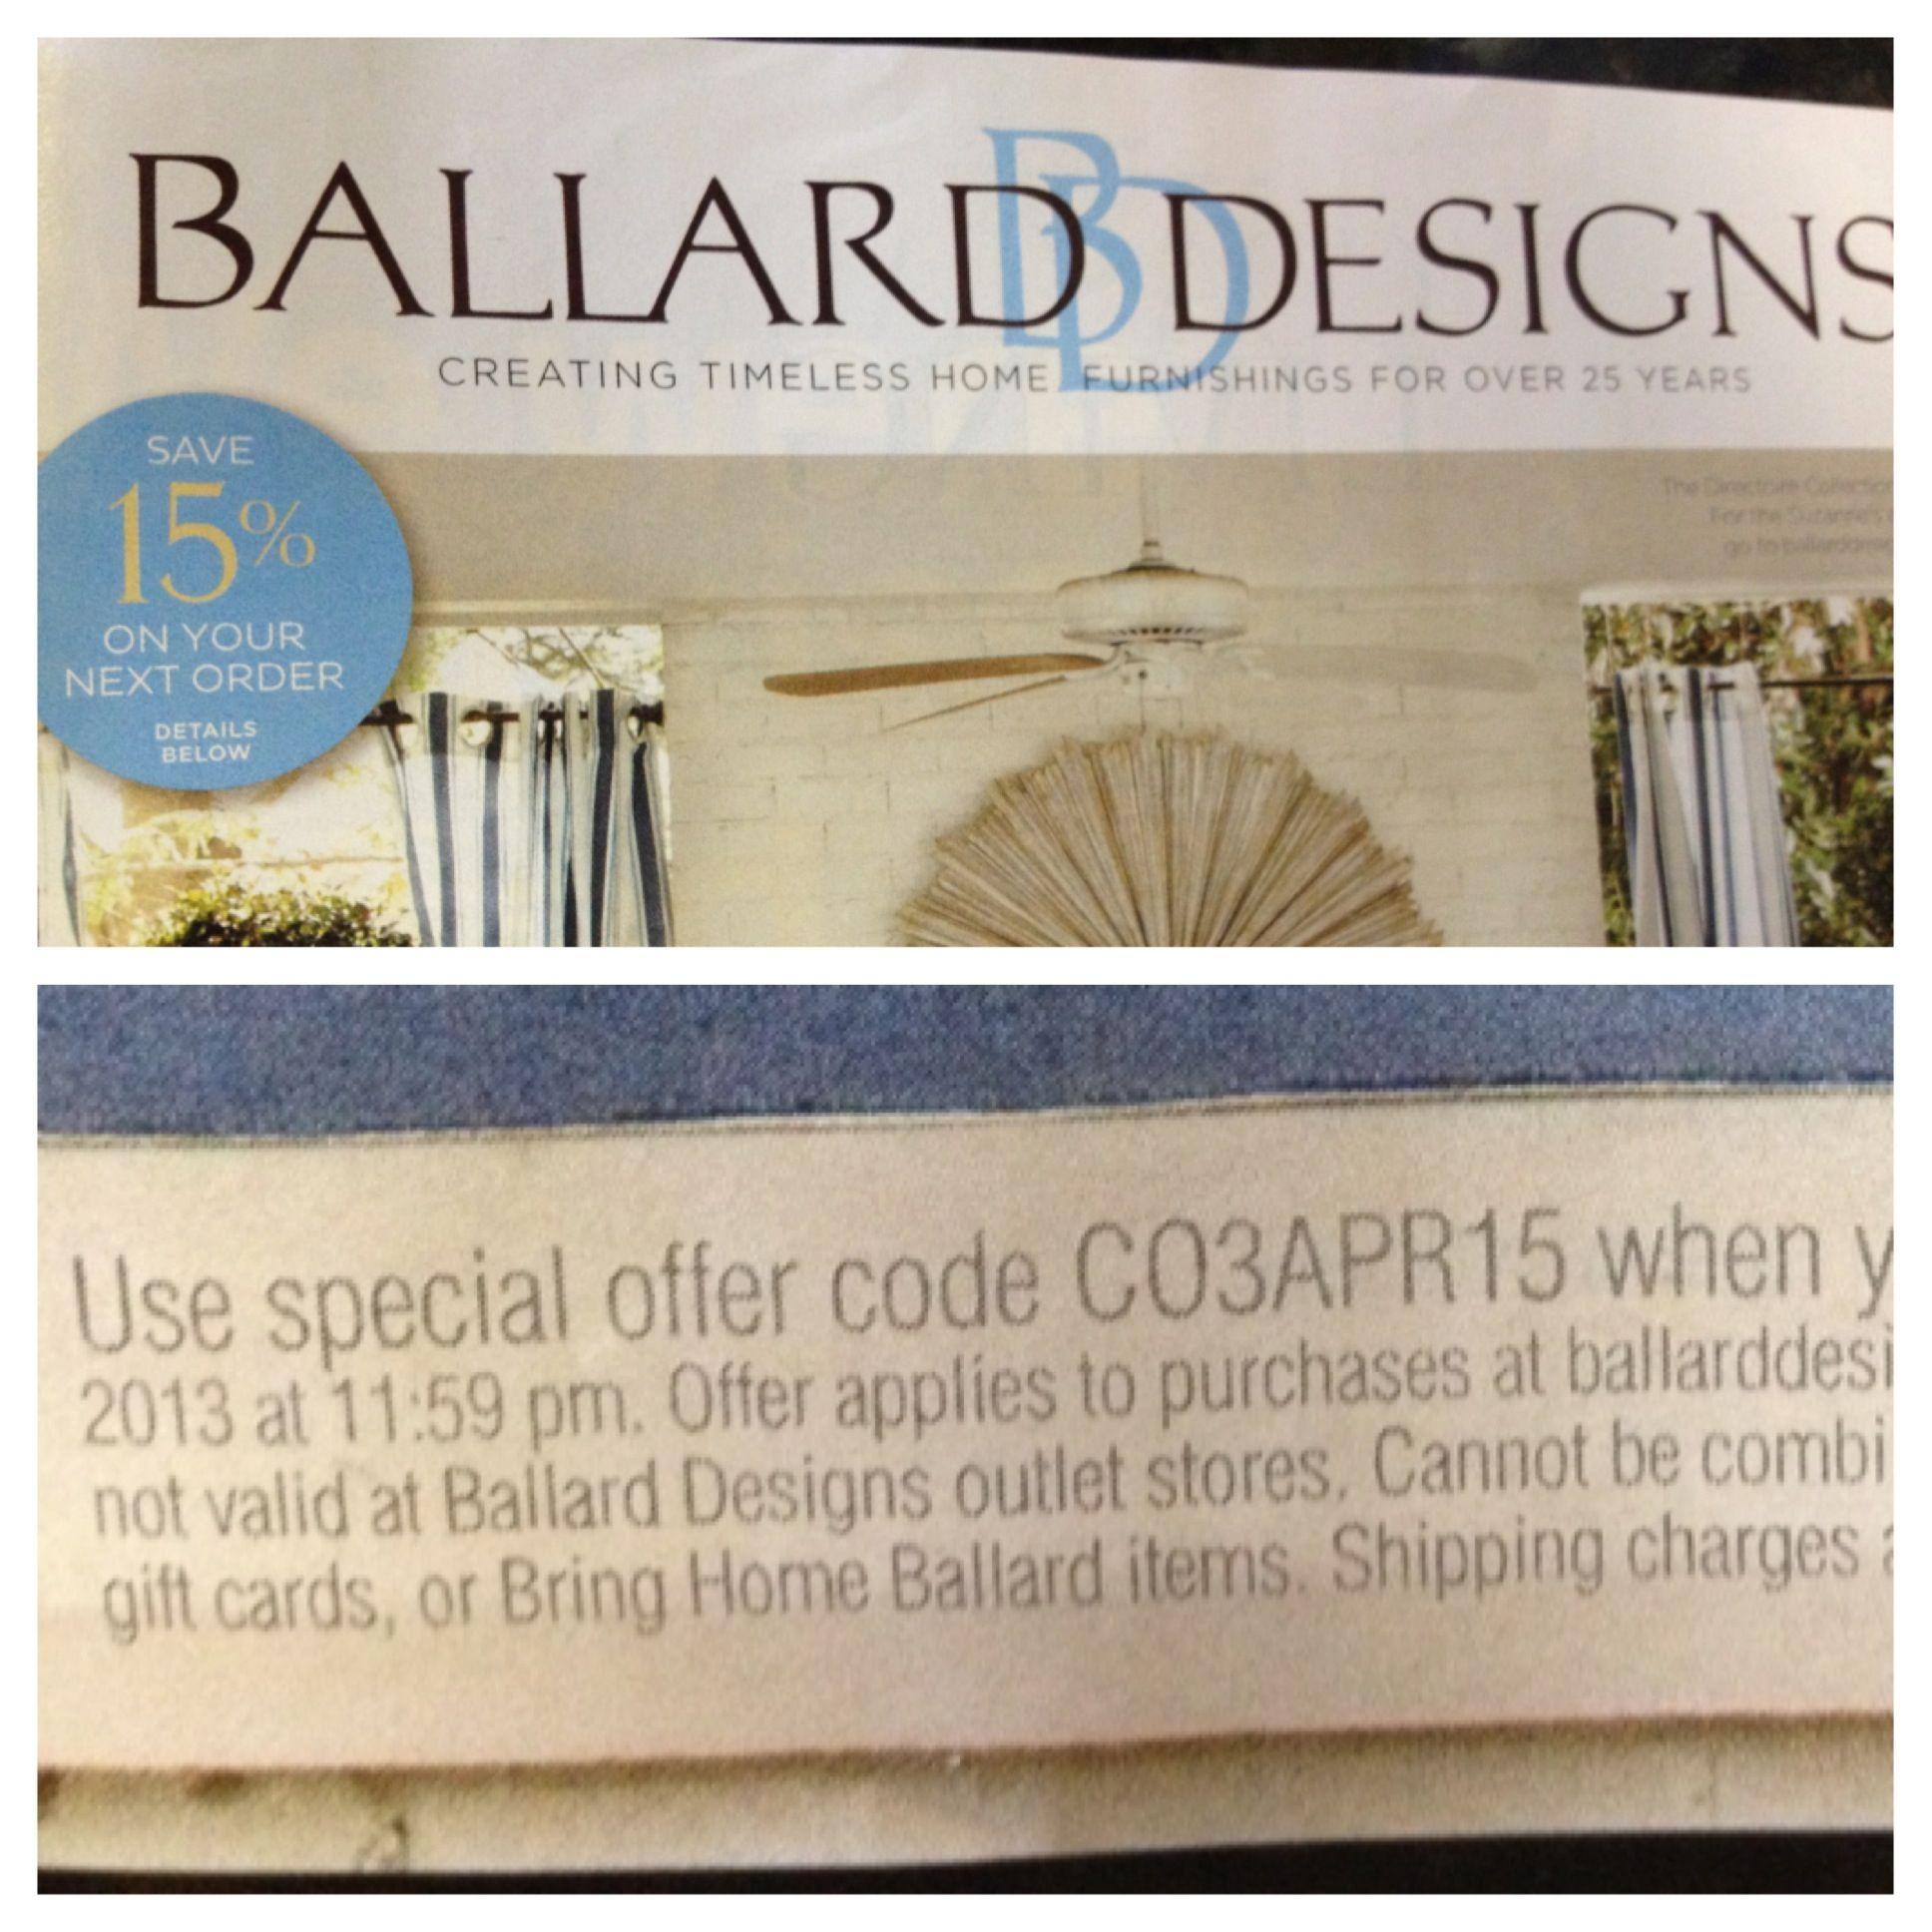 Coupon Ballard Designs ballard design coupon. | what inspires my home | pinterest